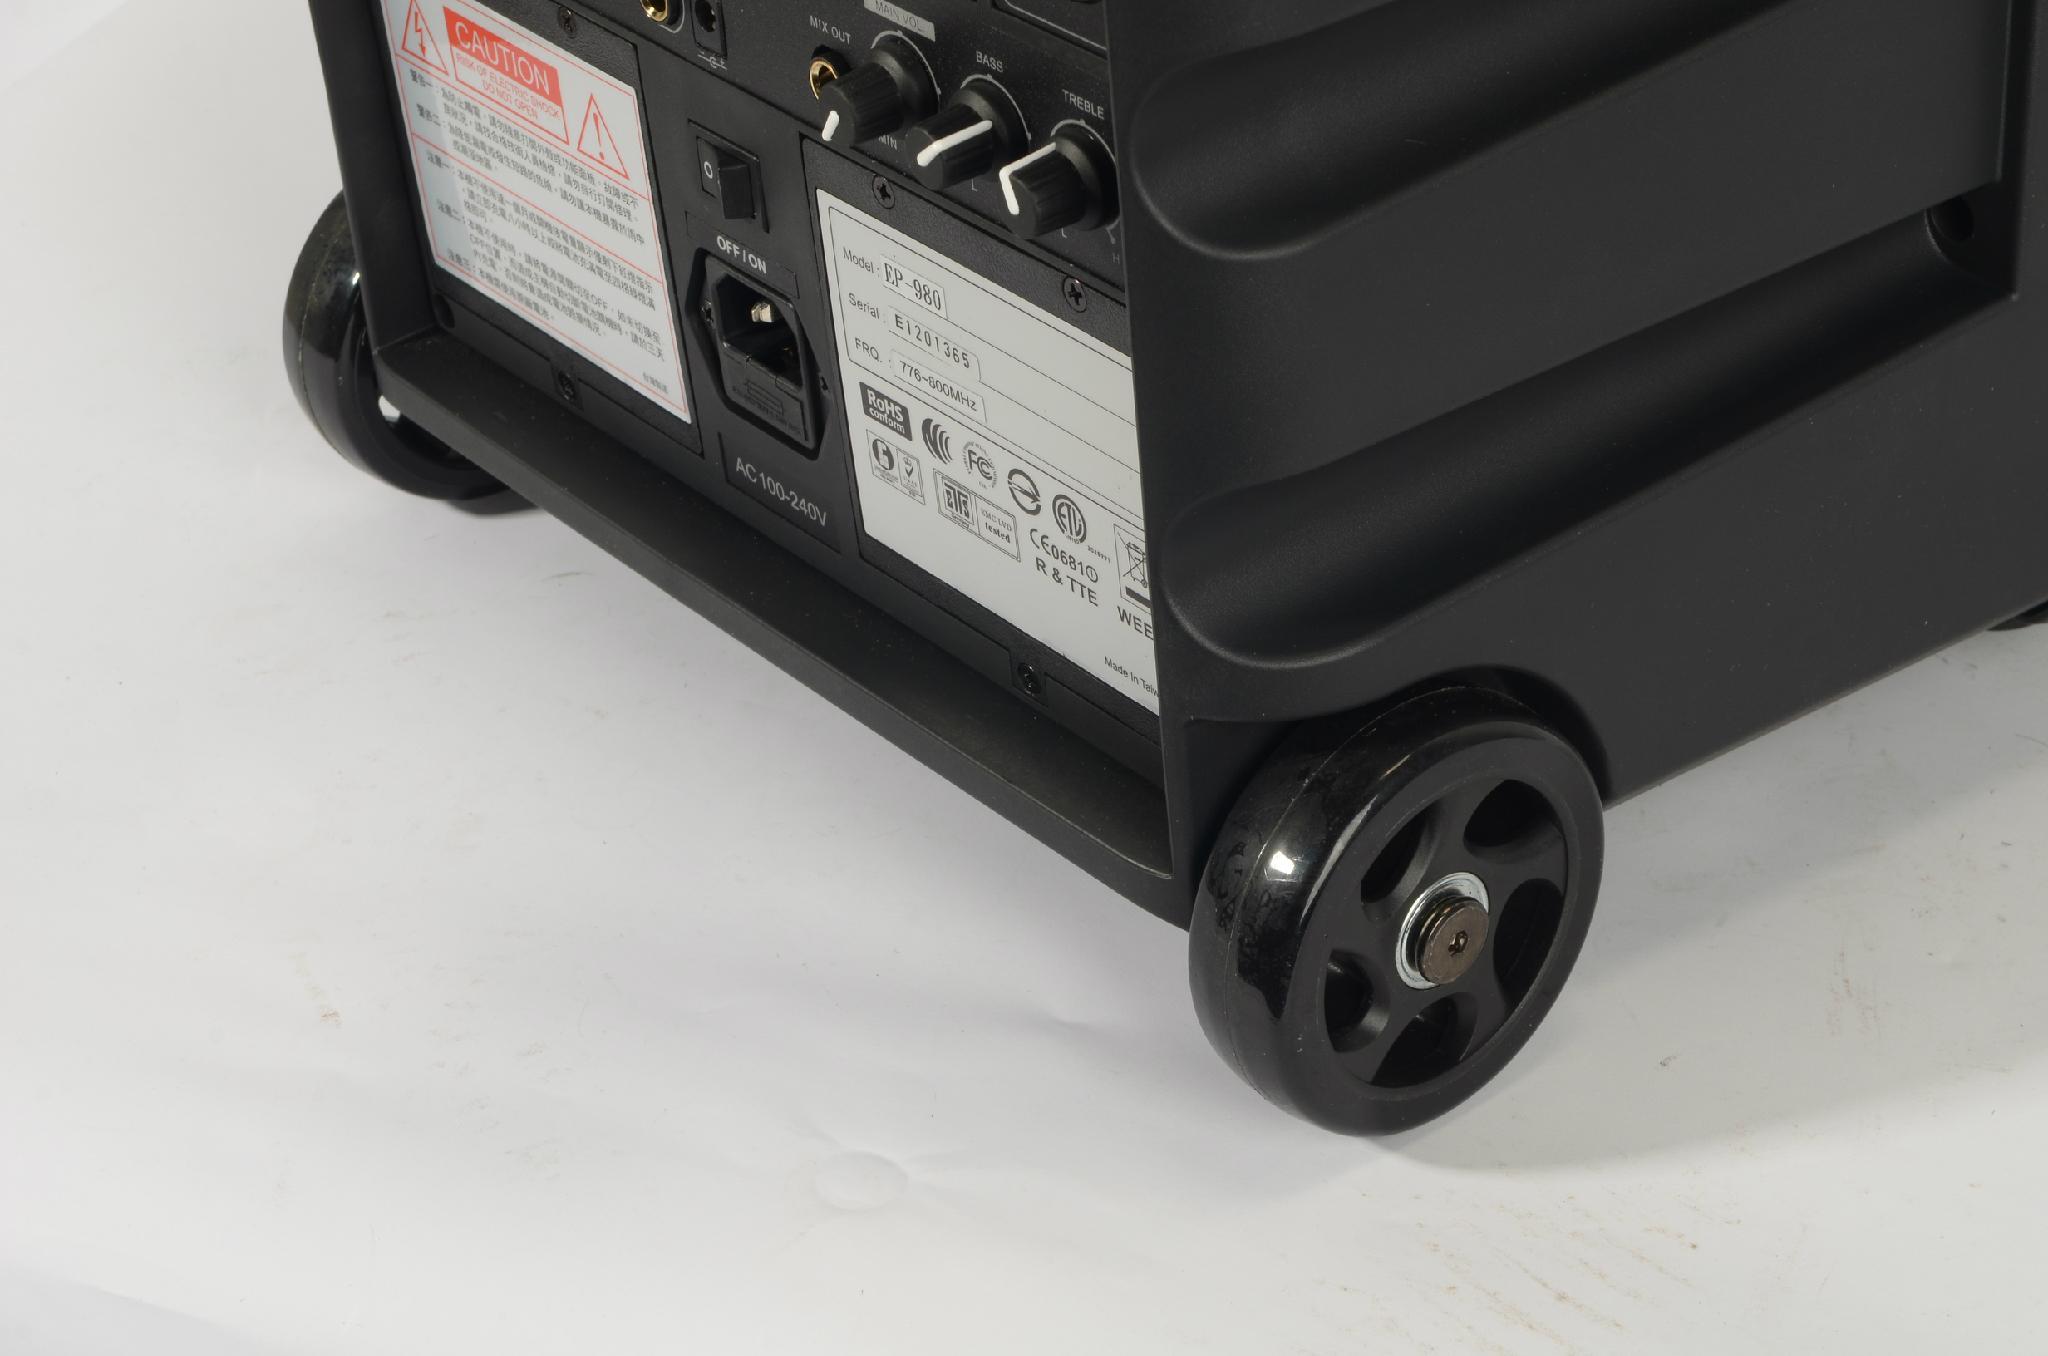 EP-980 戶外音響 4